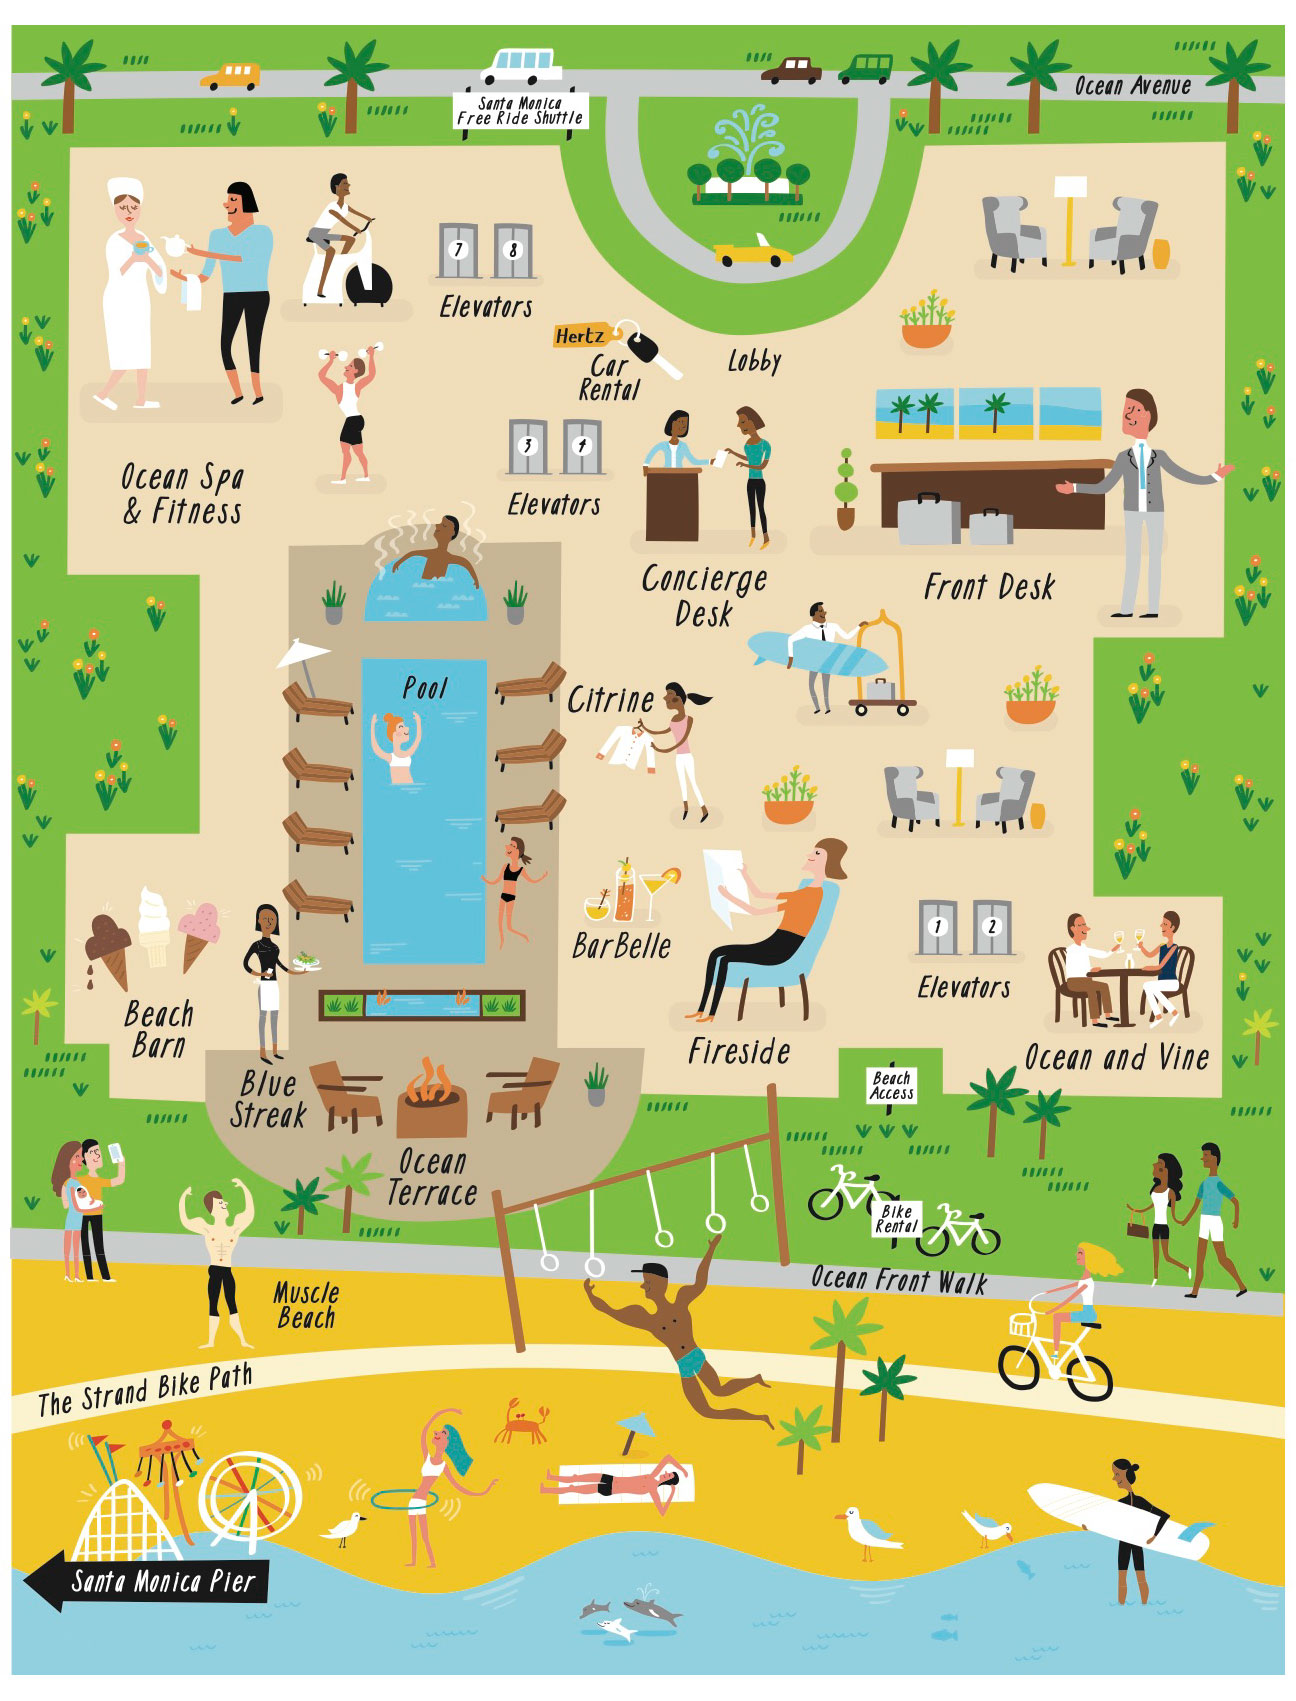 Loews Hotels - Map location: Santa Monica, CA